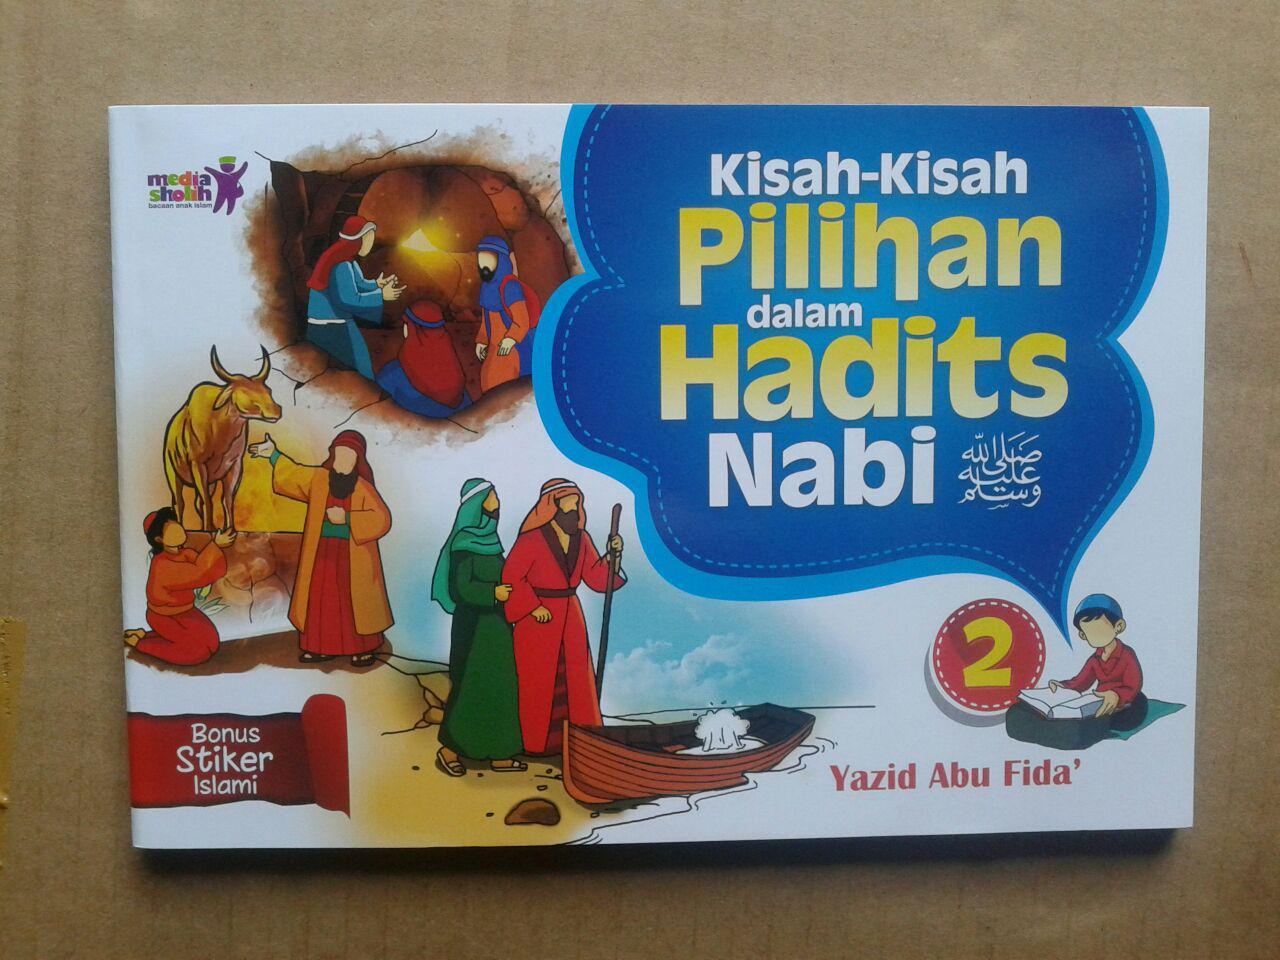 Buku Anak Kisah-Kisah Pilihan Dalam Hadits Nabi Jilid 2 cover